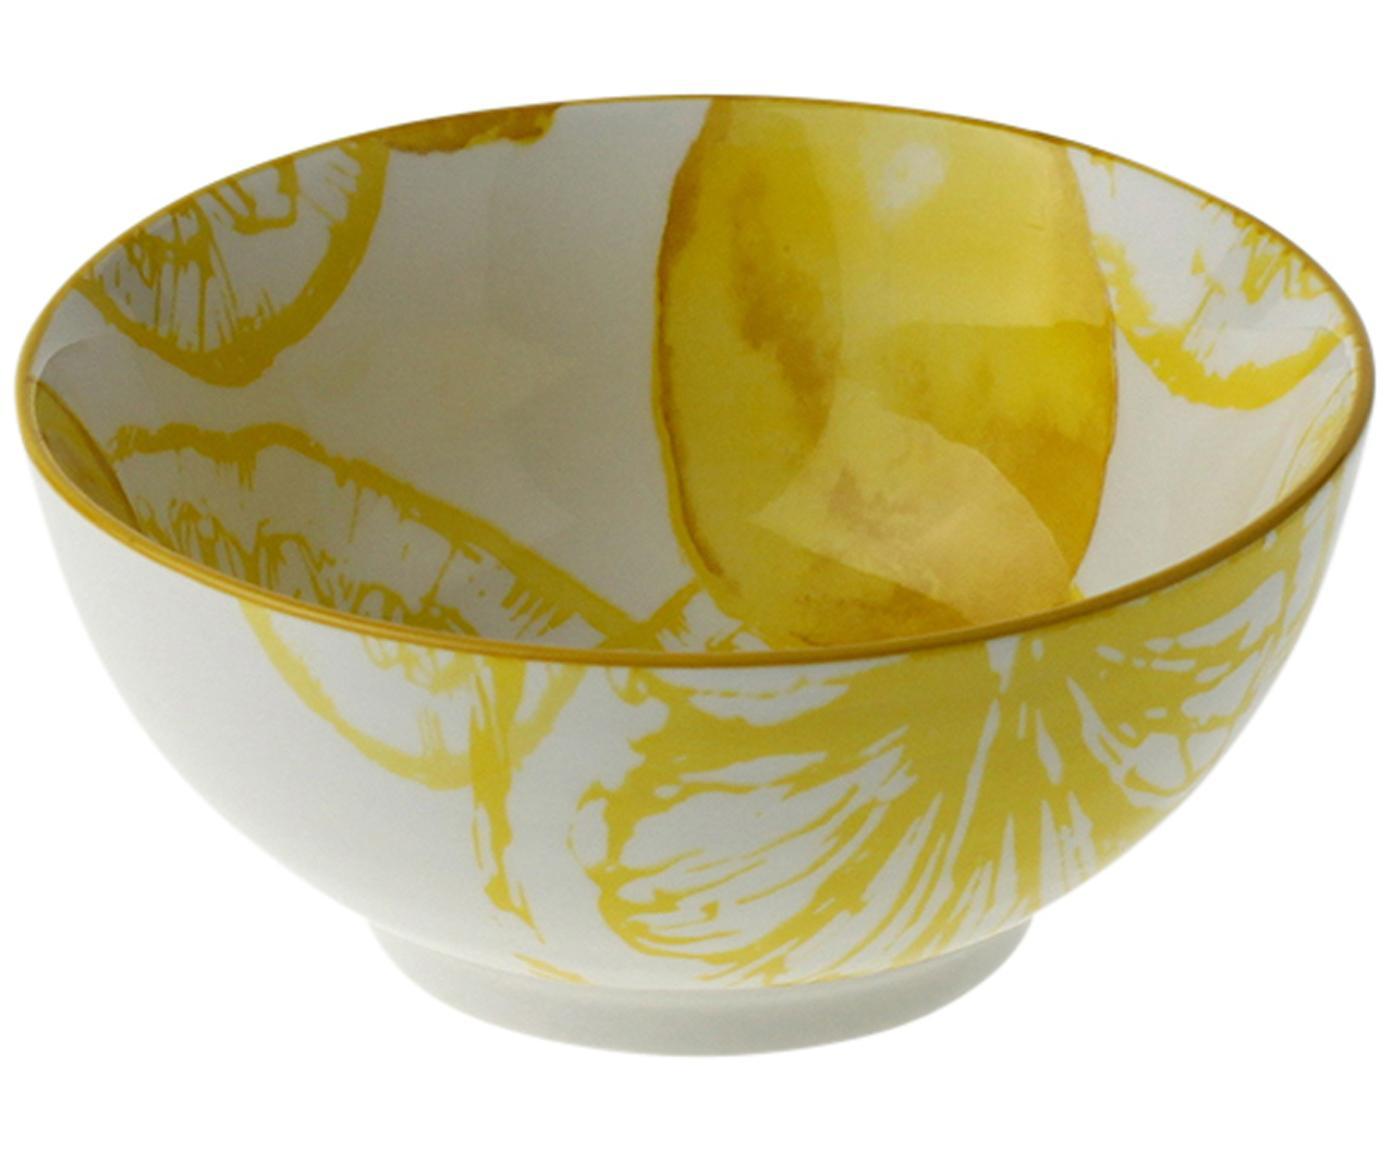 Cuenco Lemon, Porcelana, Blanco, amarillo, Ø 14 x Al 7 cm